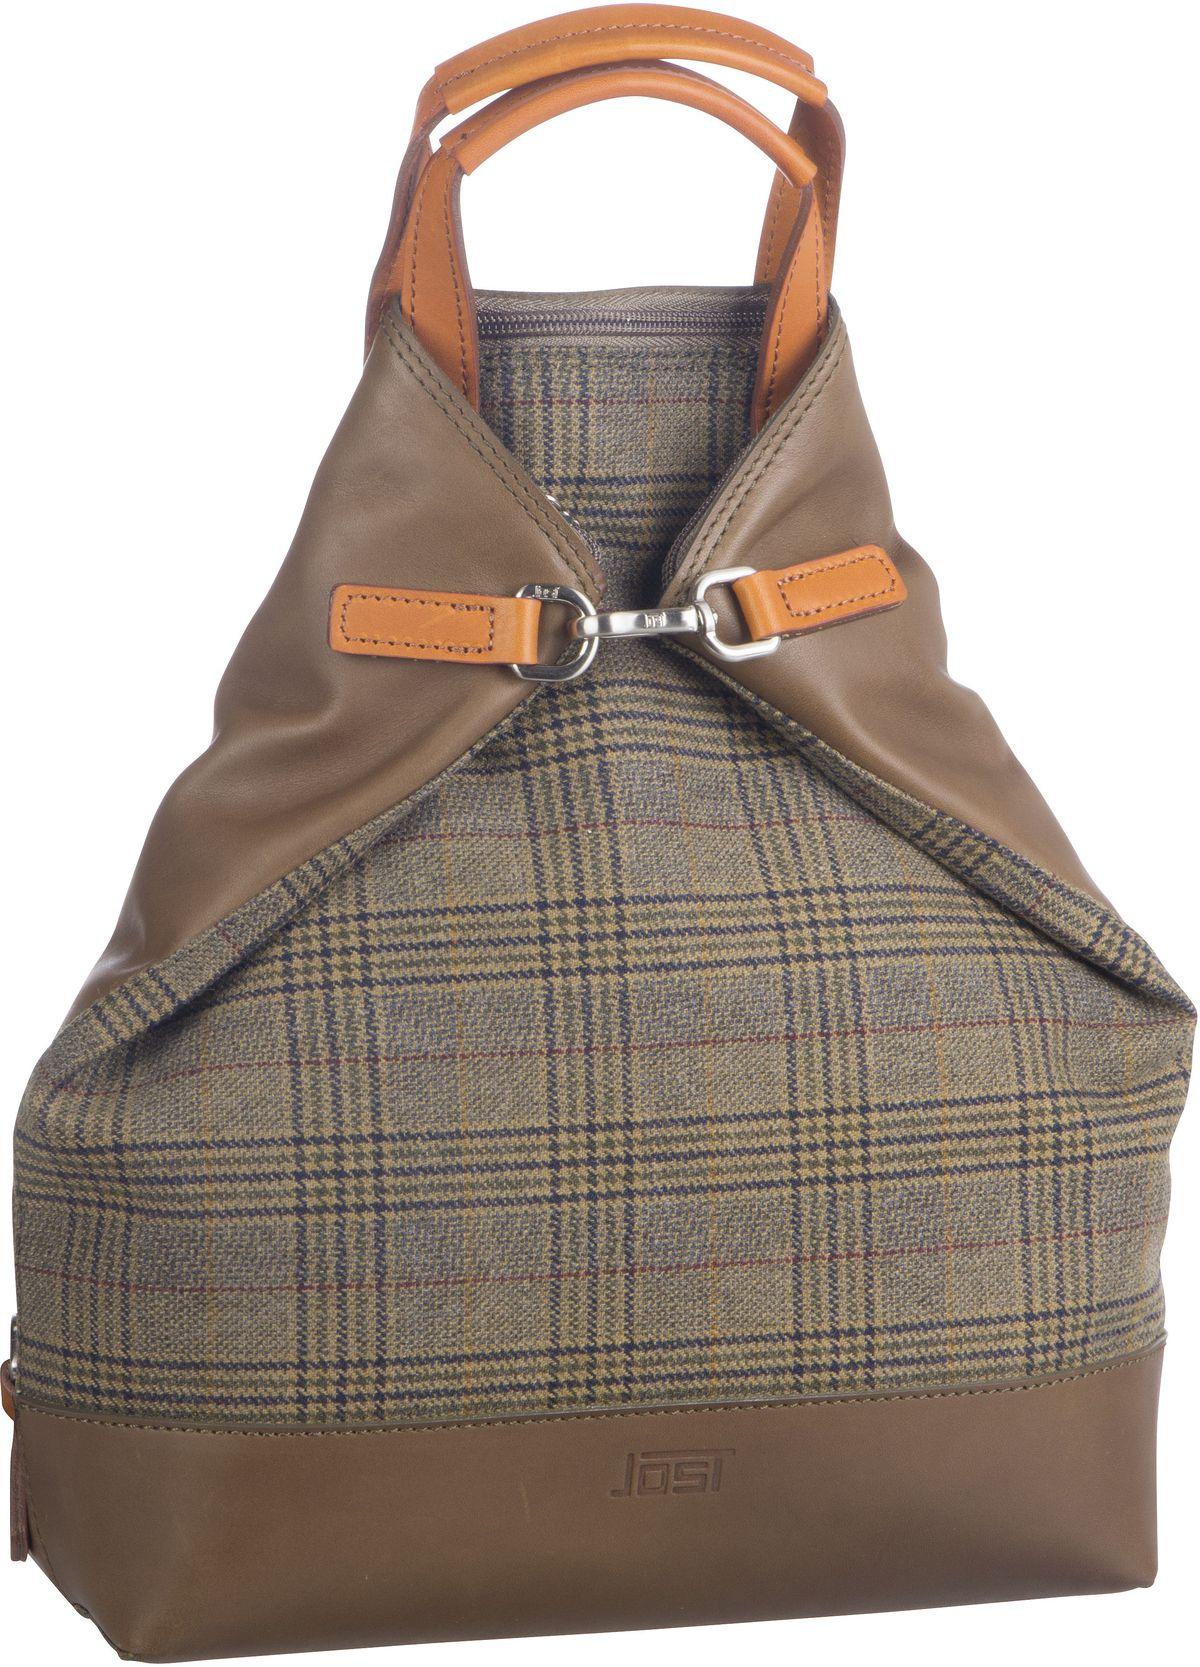 Rucksack / Daypack Checks 7234 X-Change Bag XS Olive